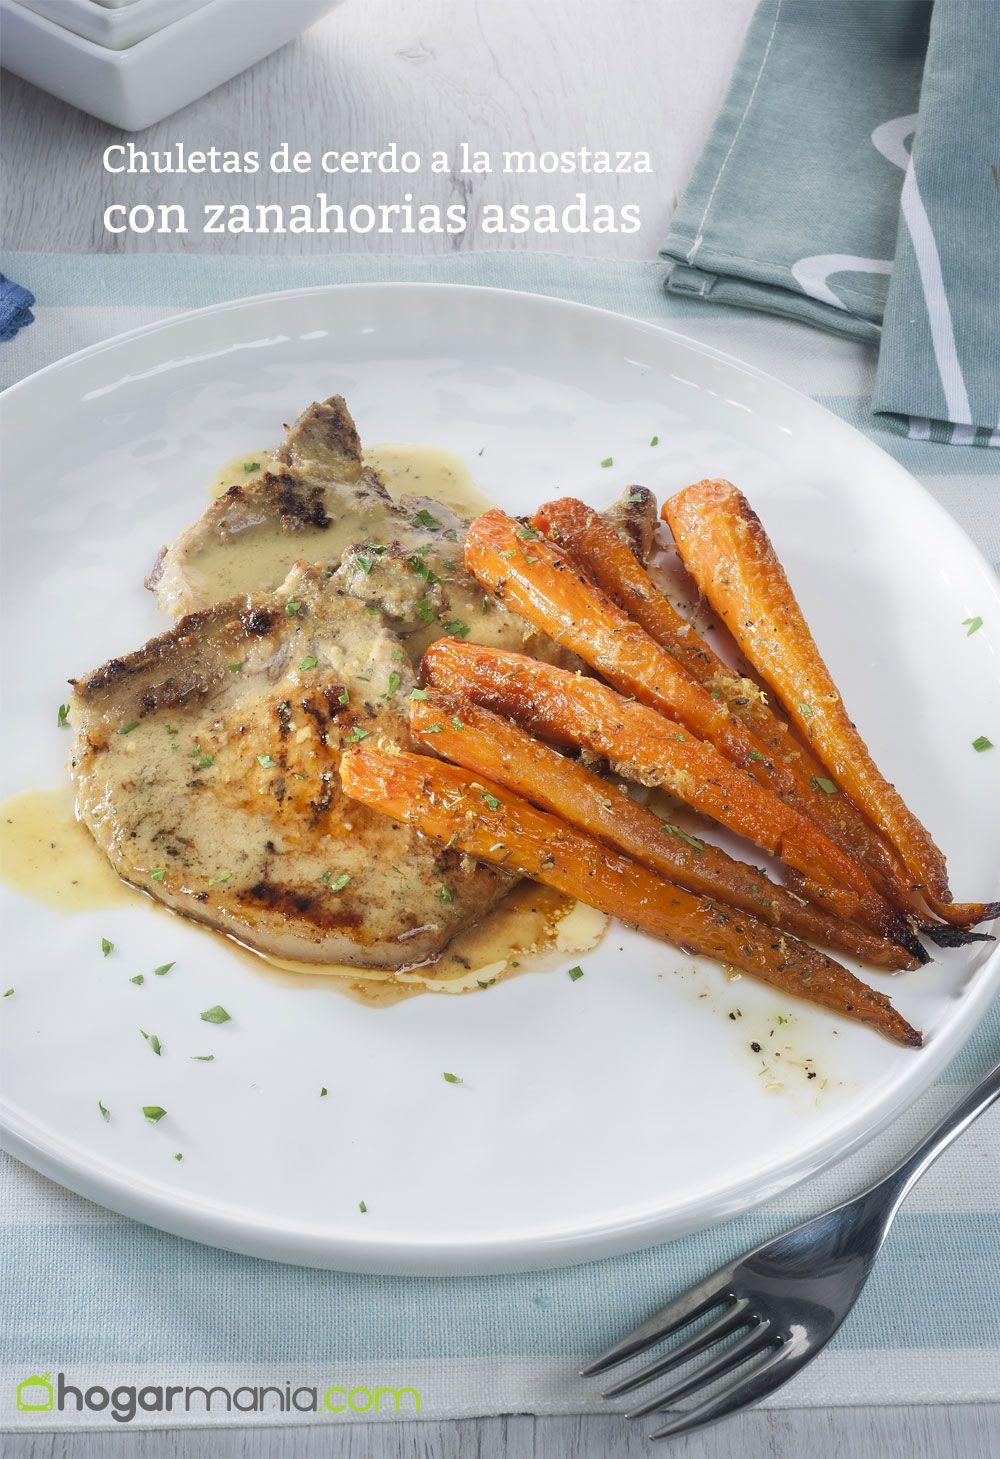 chuletas de cerdo a la mostaza con zanahorias asadas